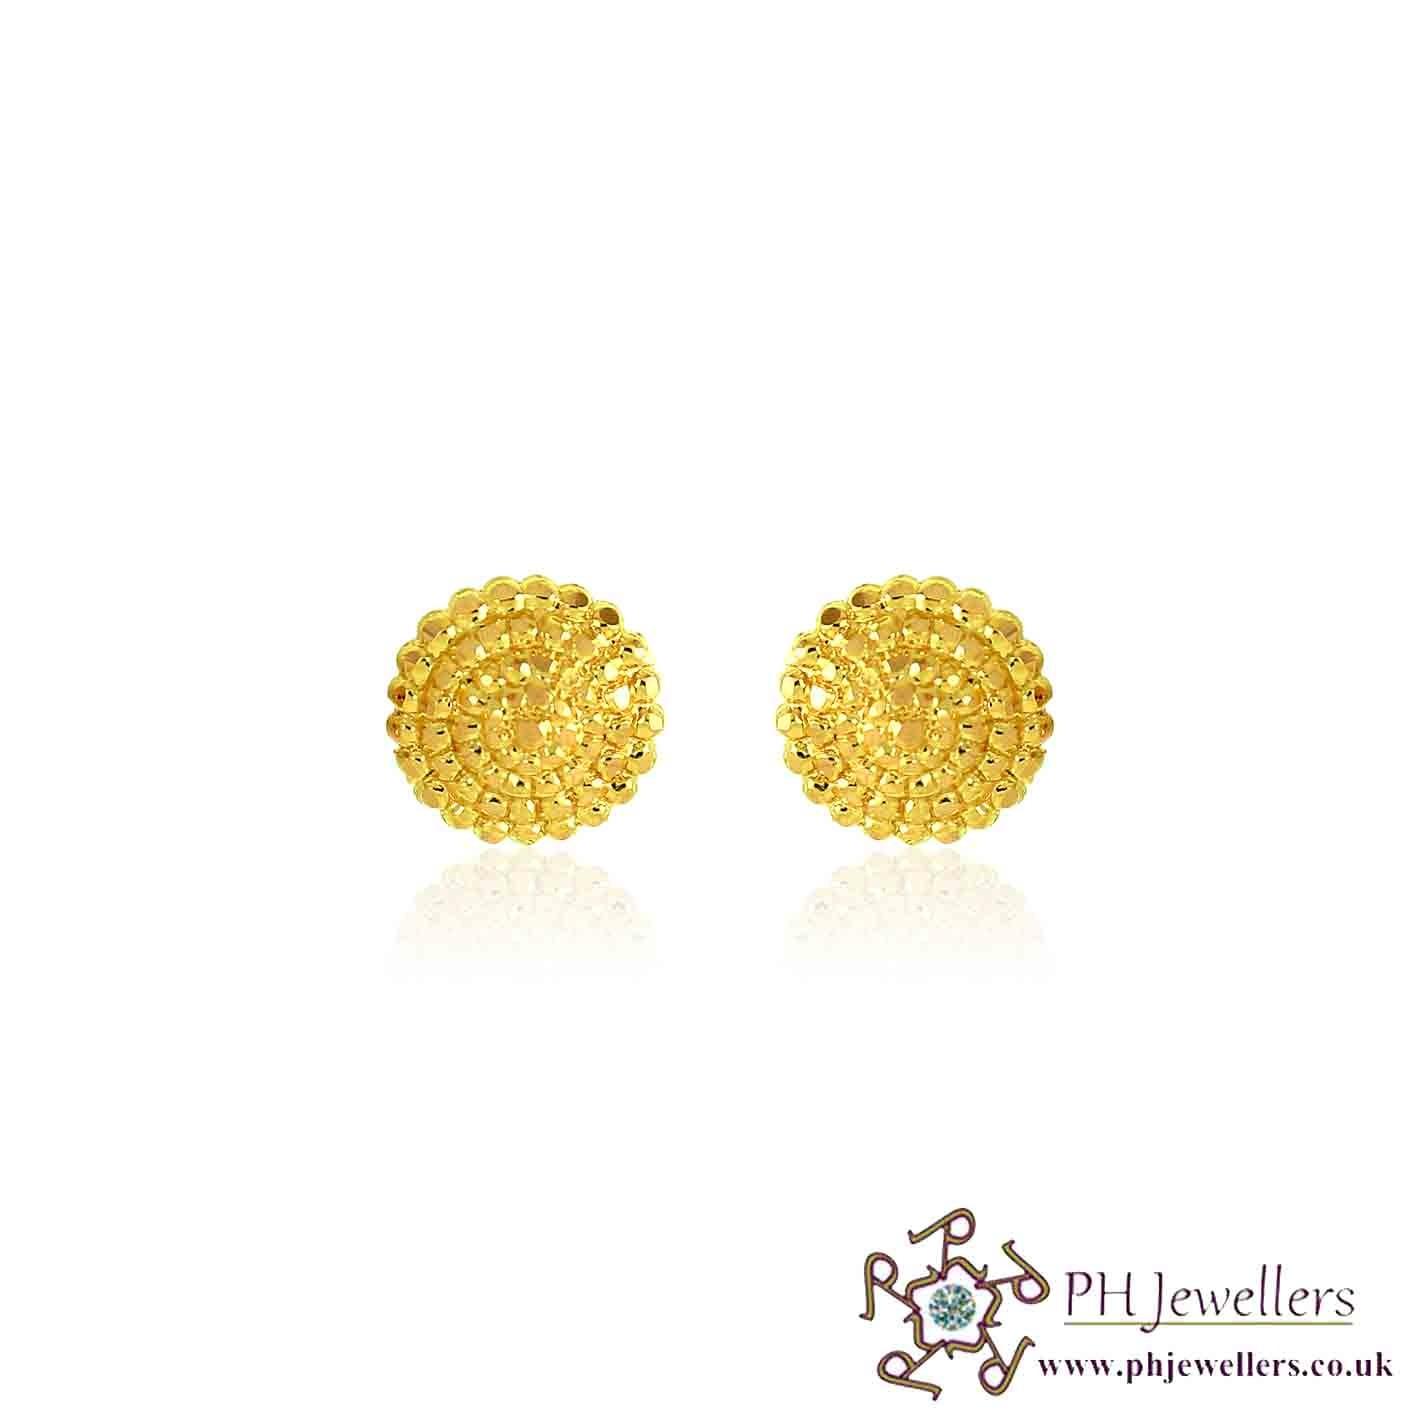 22CT 916 Yellow Gold Earring TE73